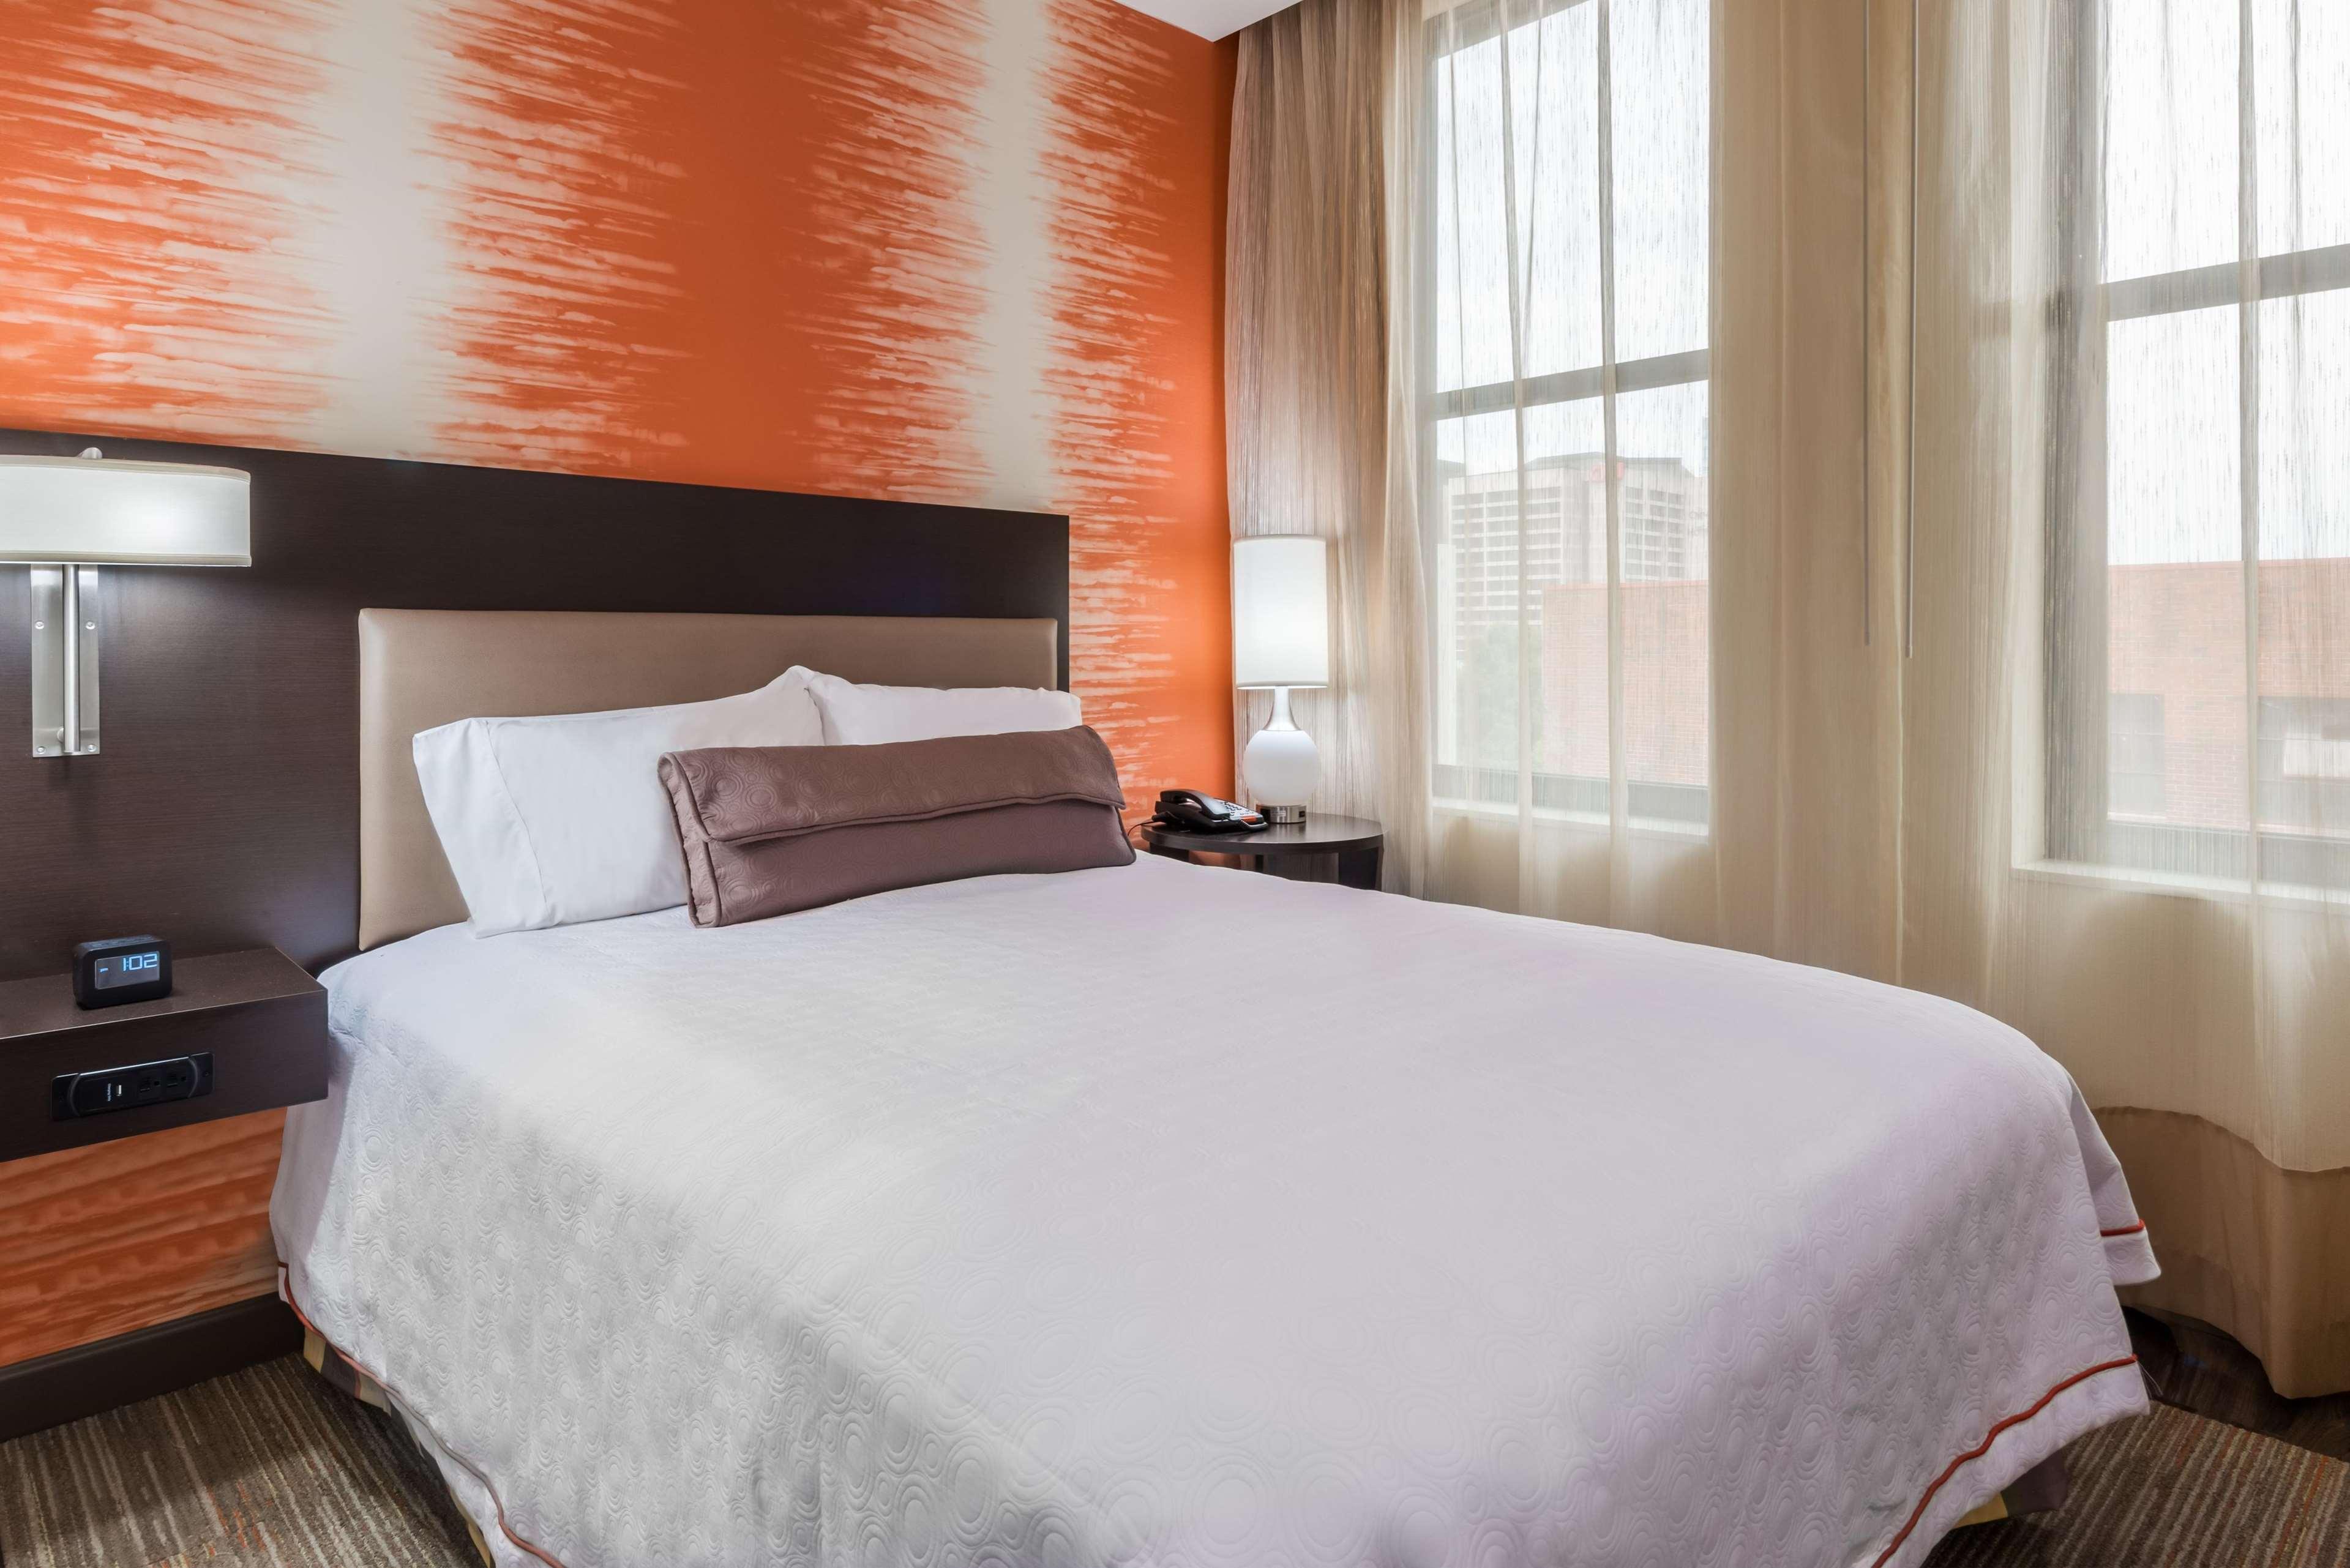 Home2 Suites by Hilton Atlanta Downtown image 15